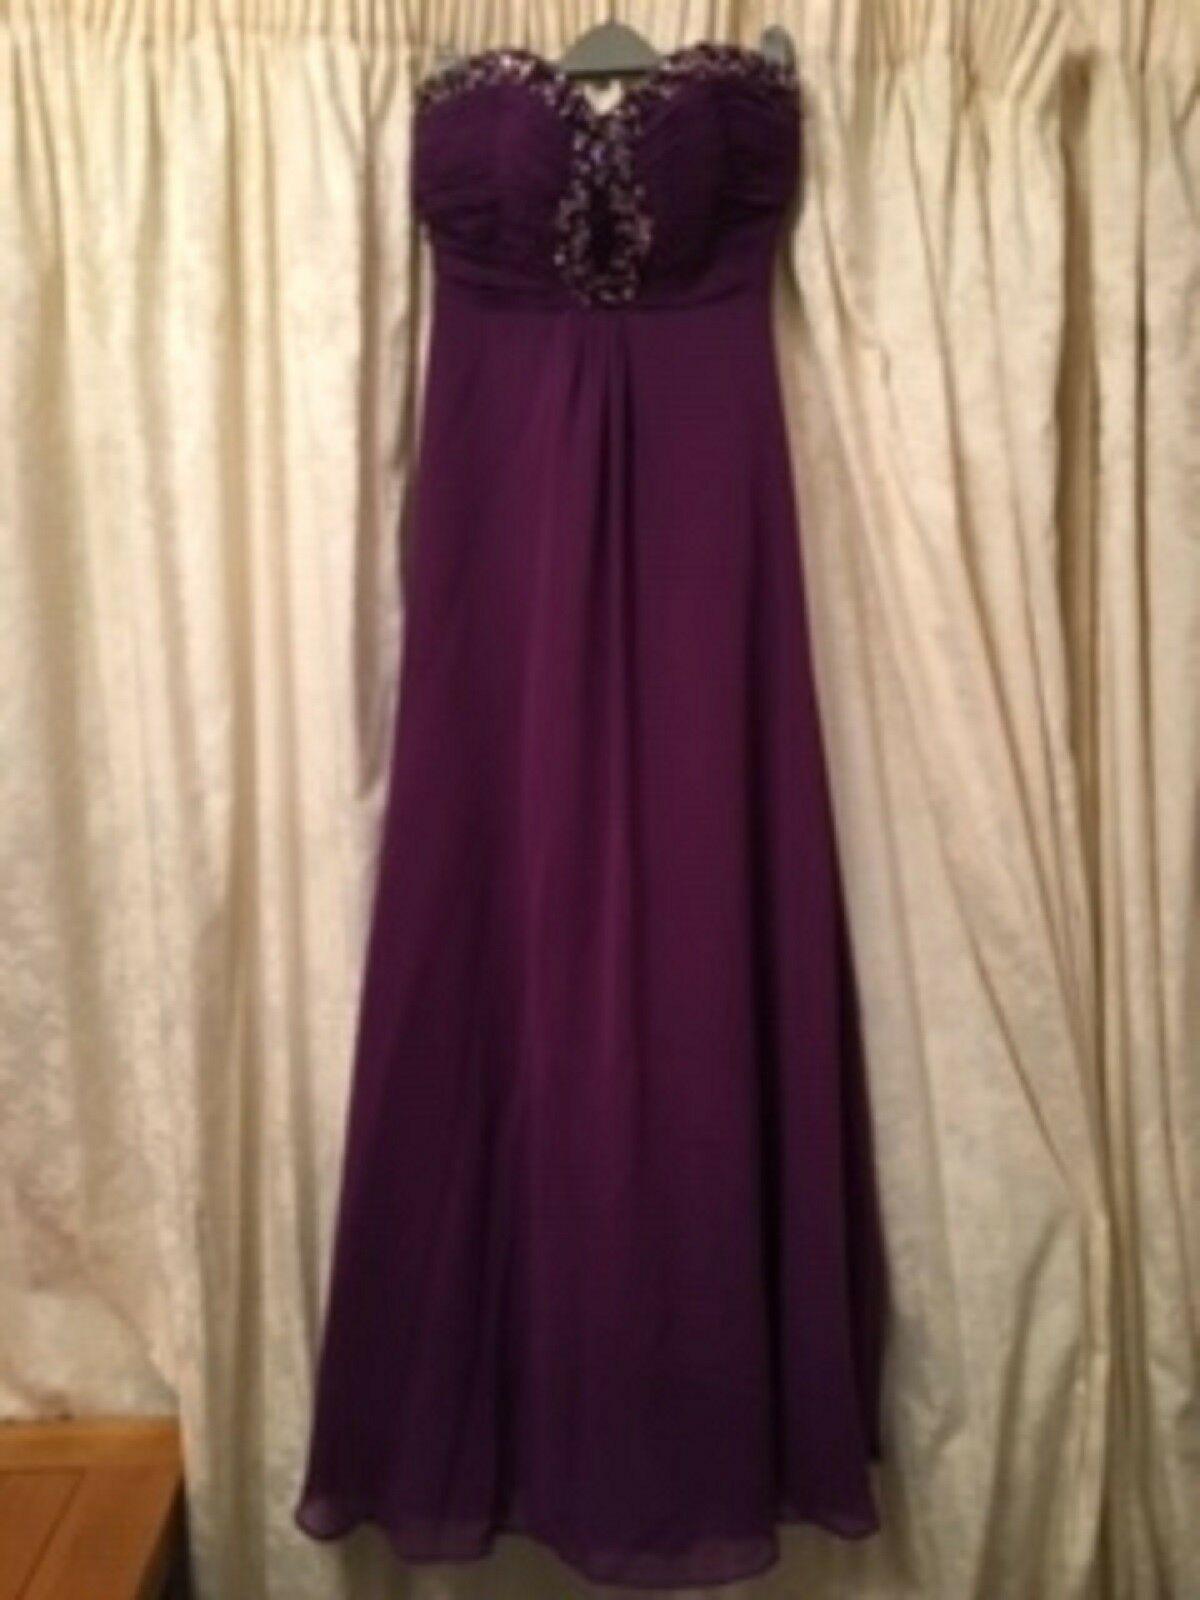 17 Kreativ Abendkleid In Lila DesignDesigner Top Abendkleid In Lila Boutique